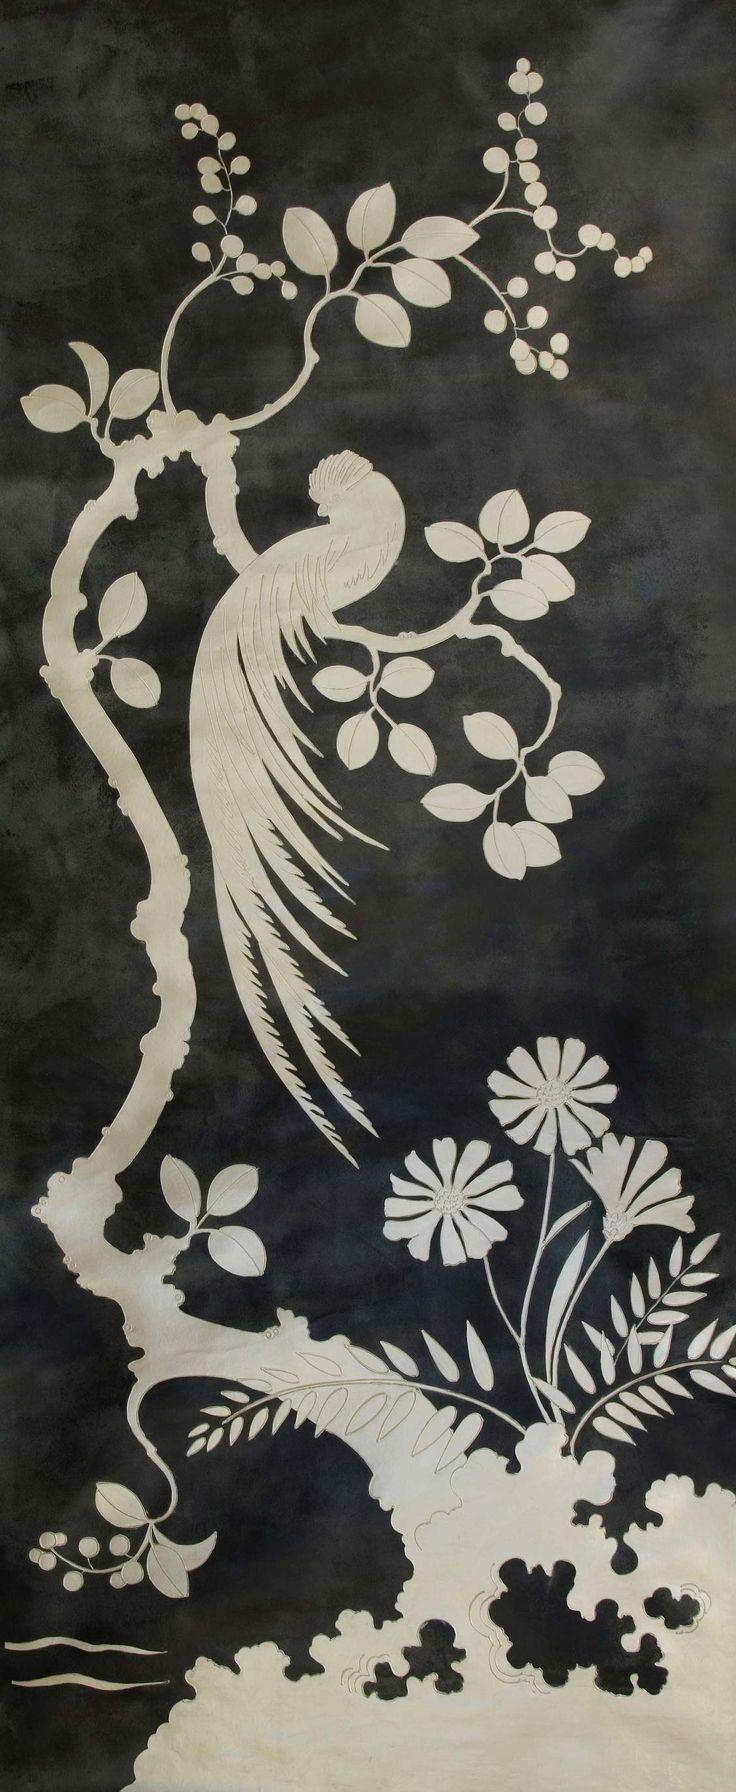 chinon | Fromental chinoiserie wallpaper black + white #drdwallpaper